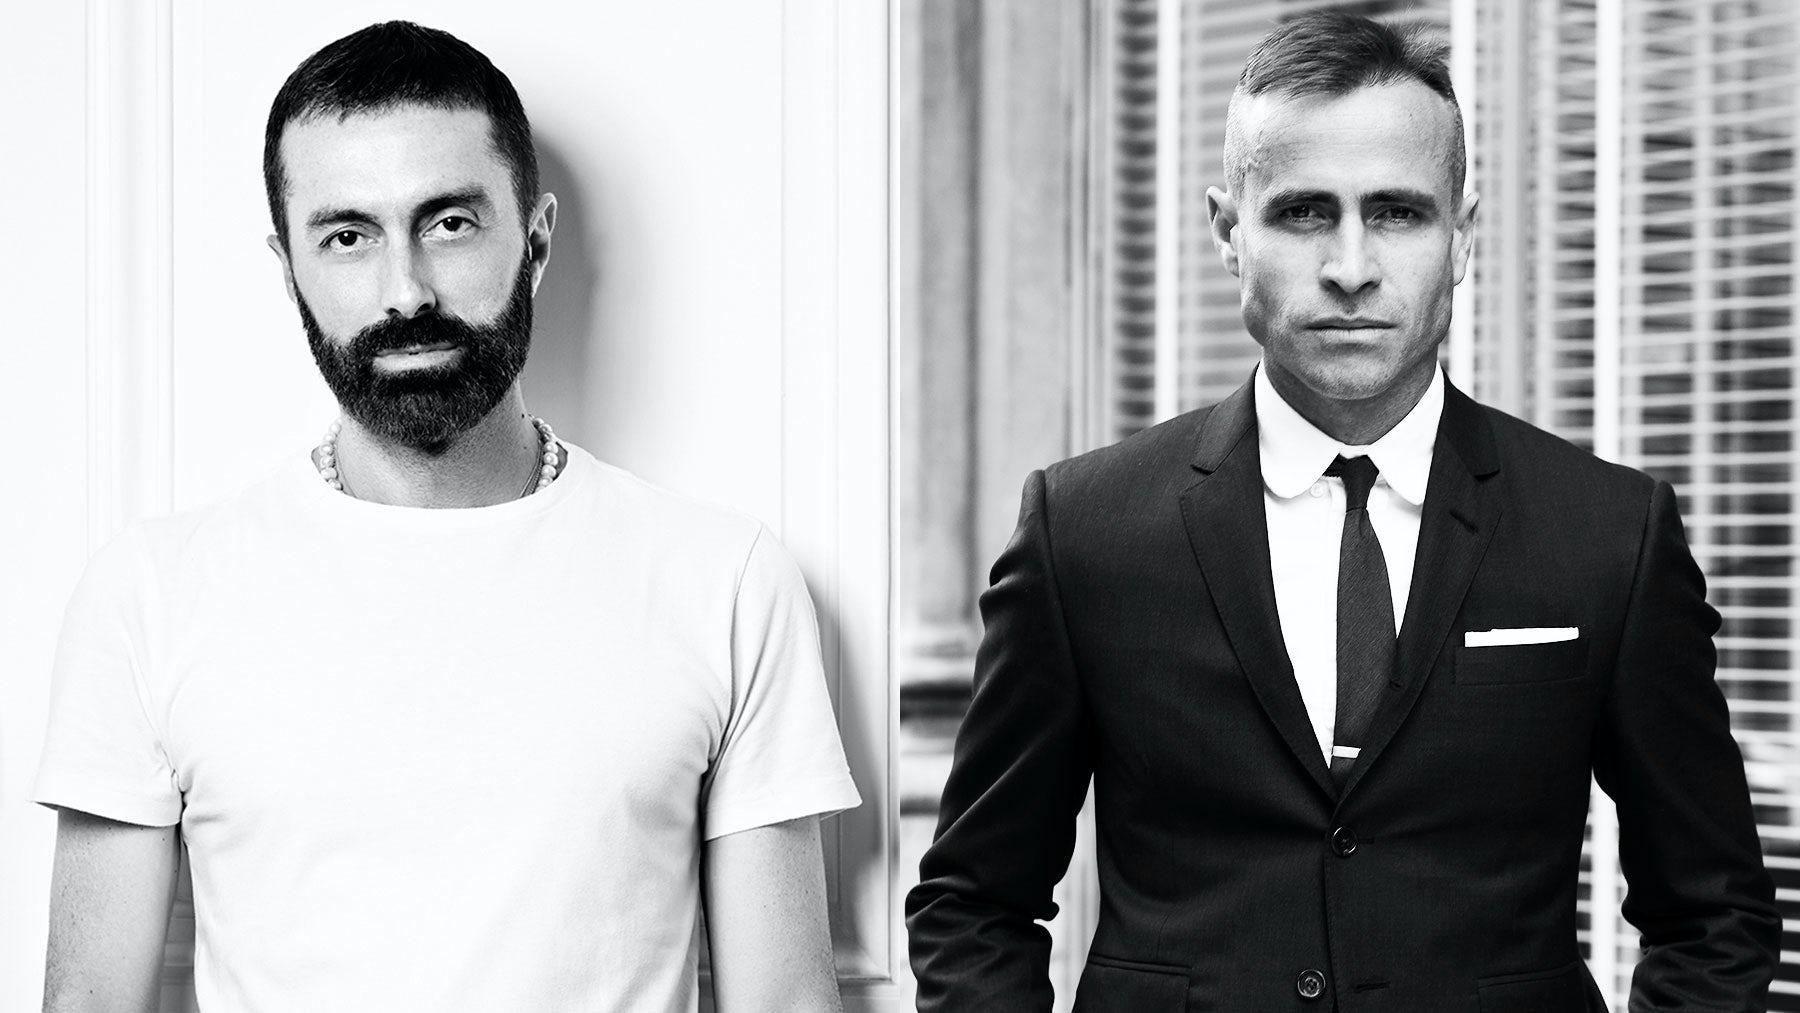 Moncler Gamme Rouge designer Giambattista Valli and Moncler Gamme Bleu designer Thom Browne | Sources: Courtesy